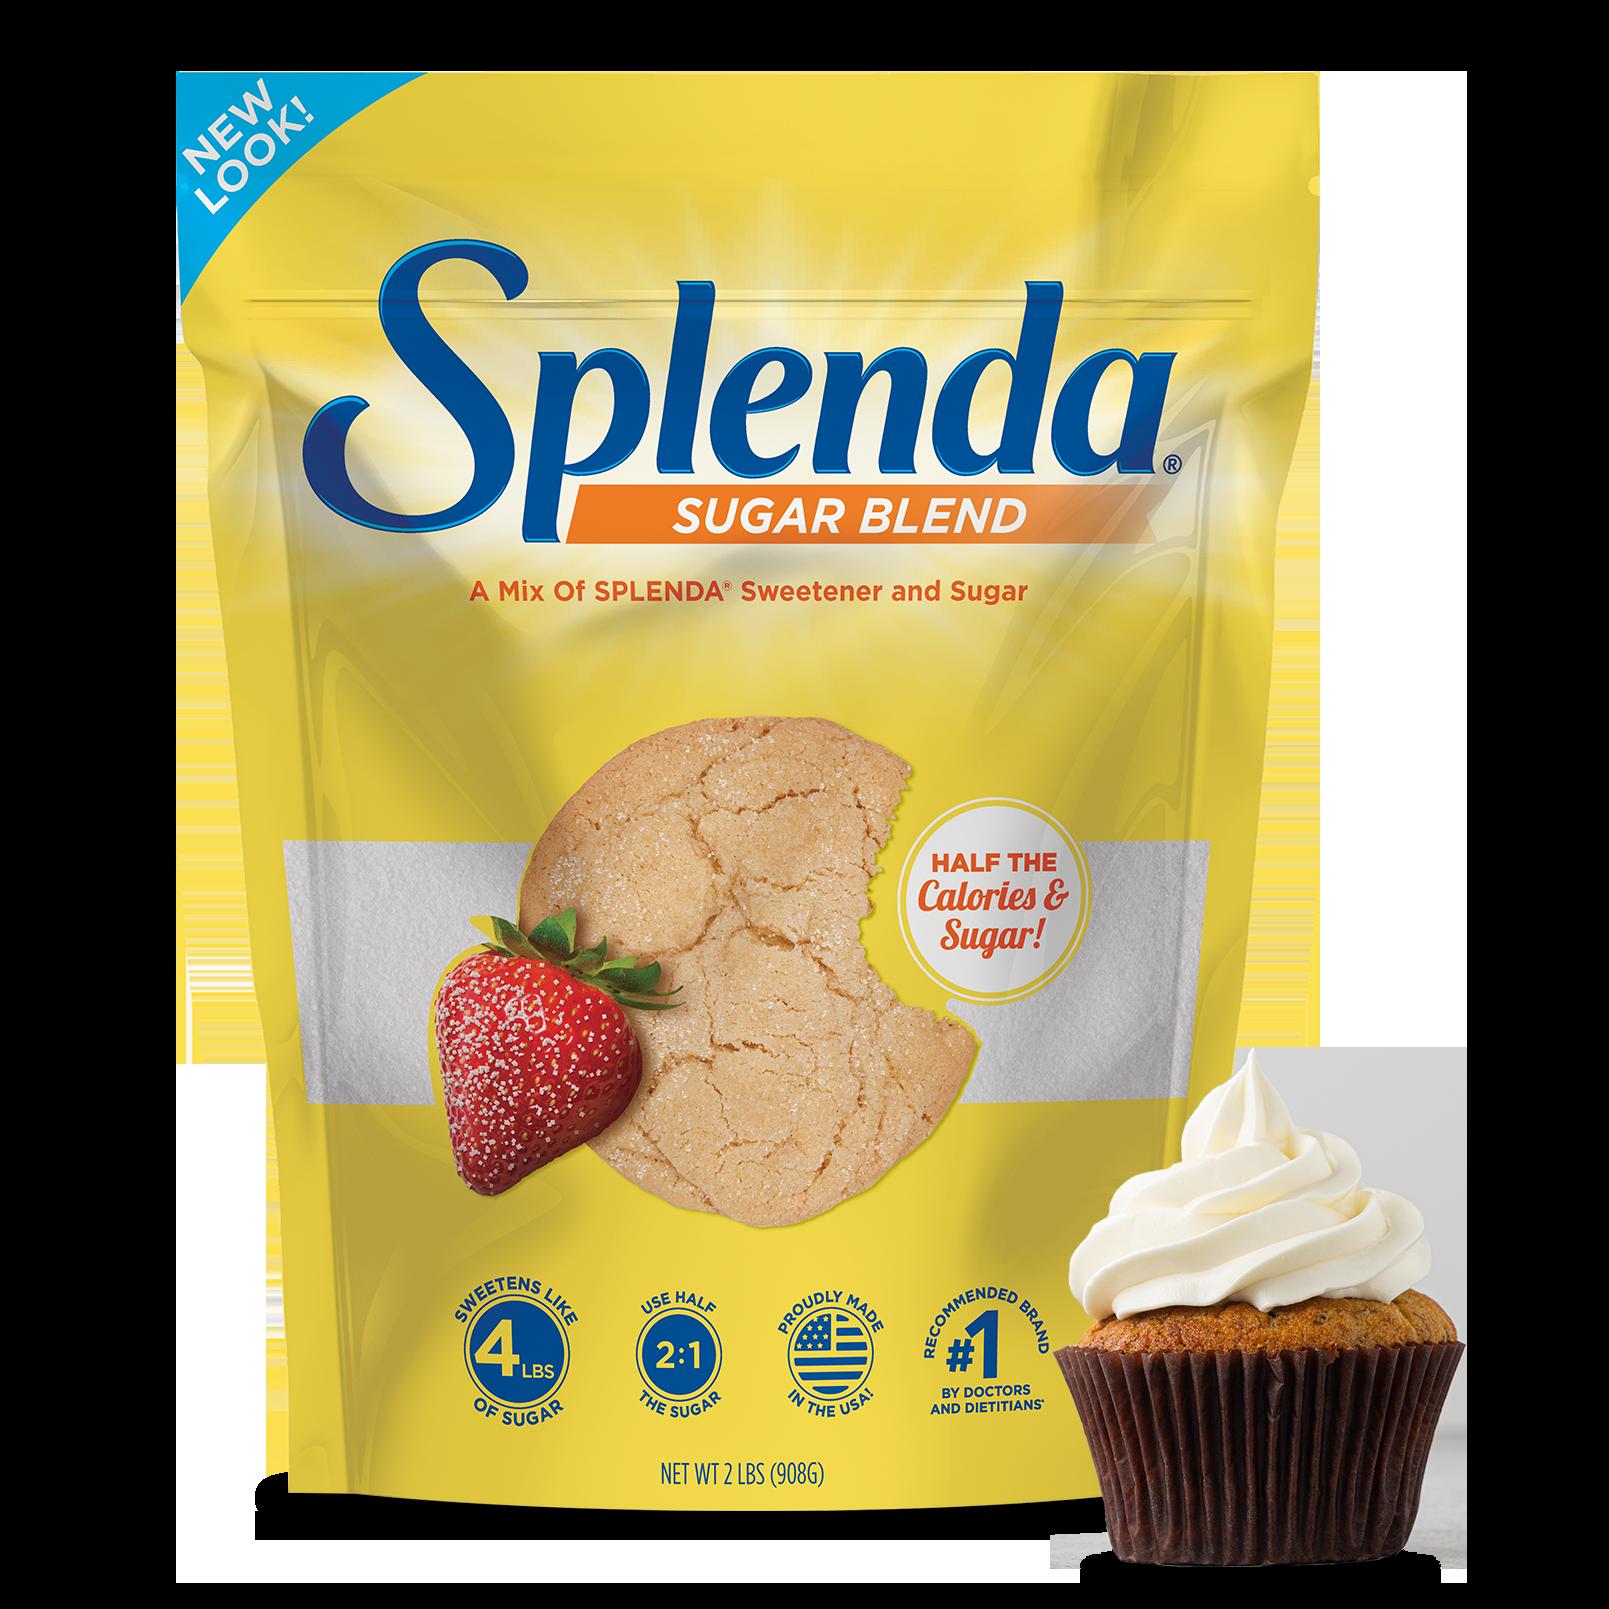 Splenda Sugar Blend Product Image